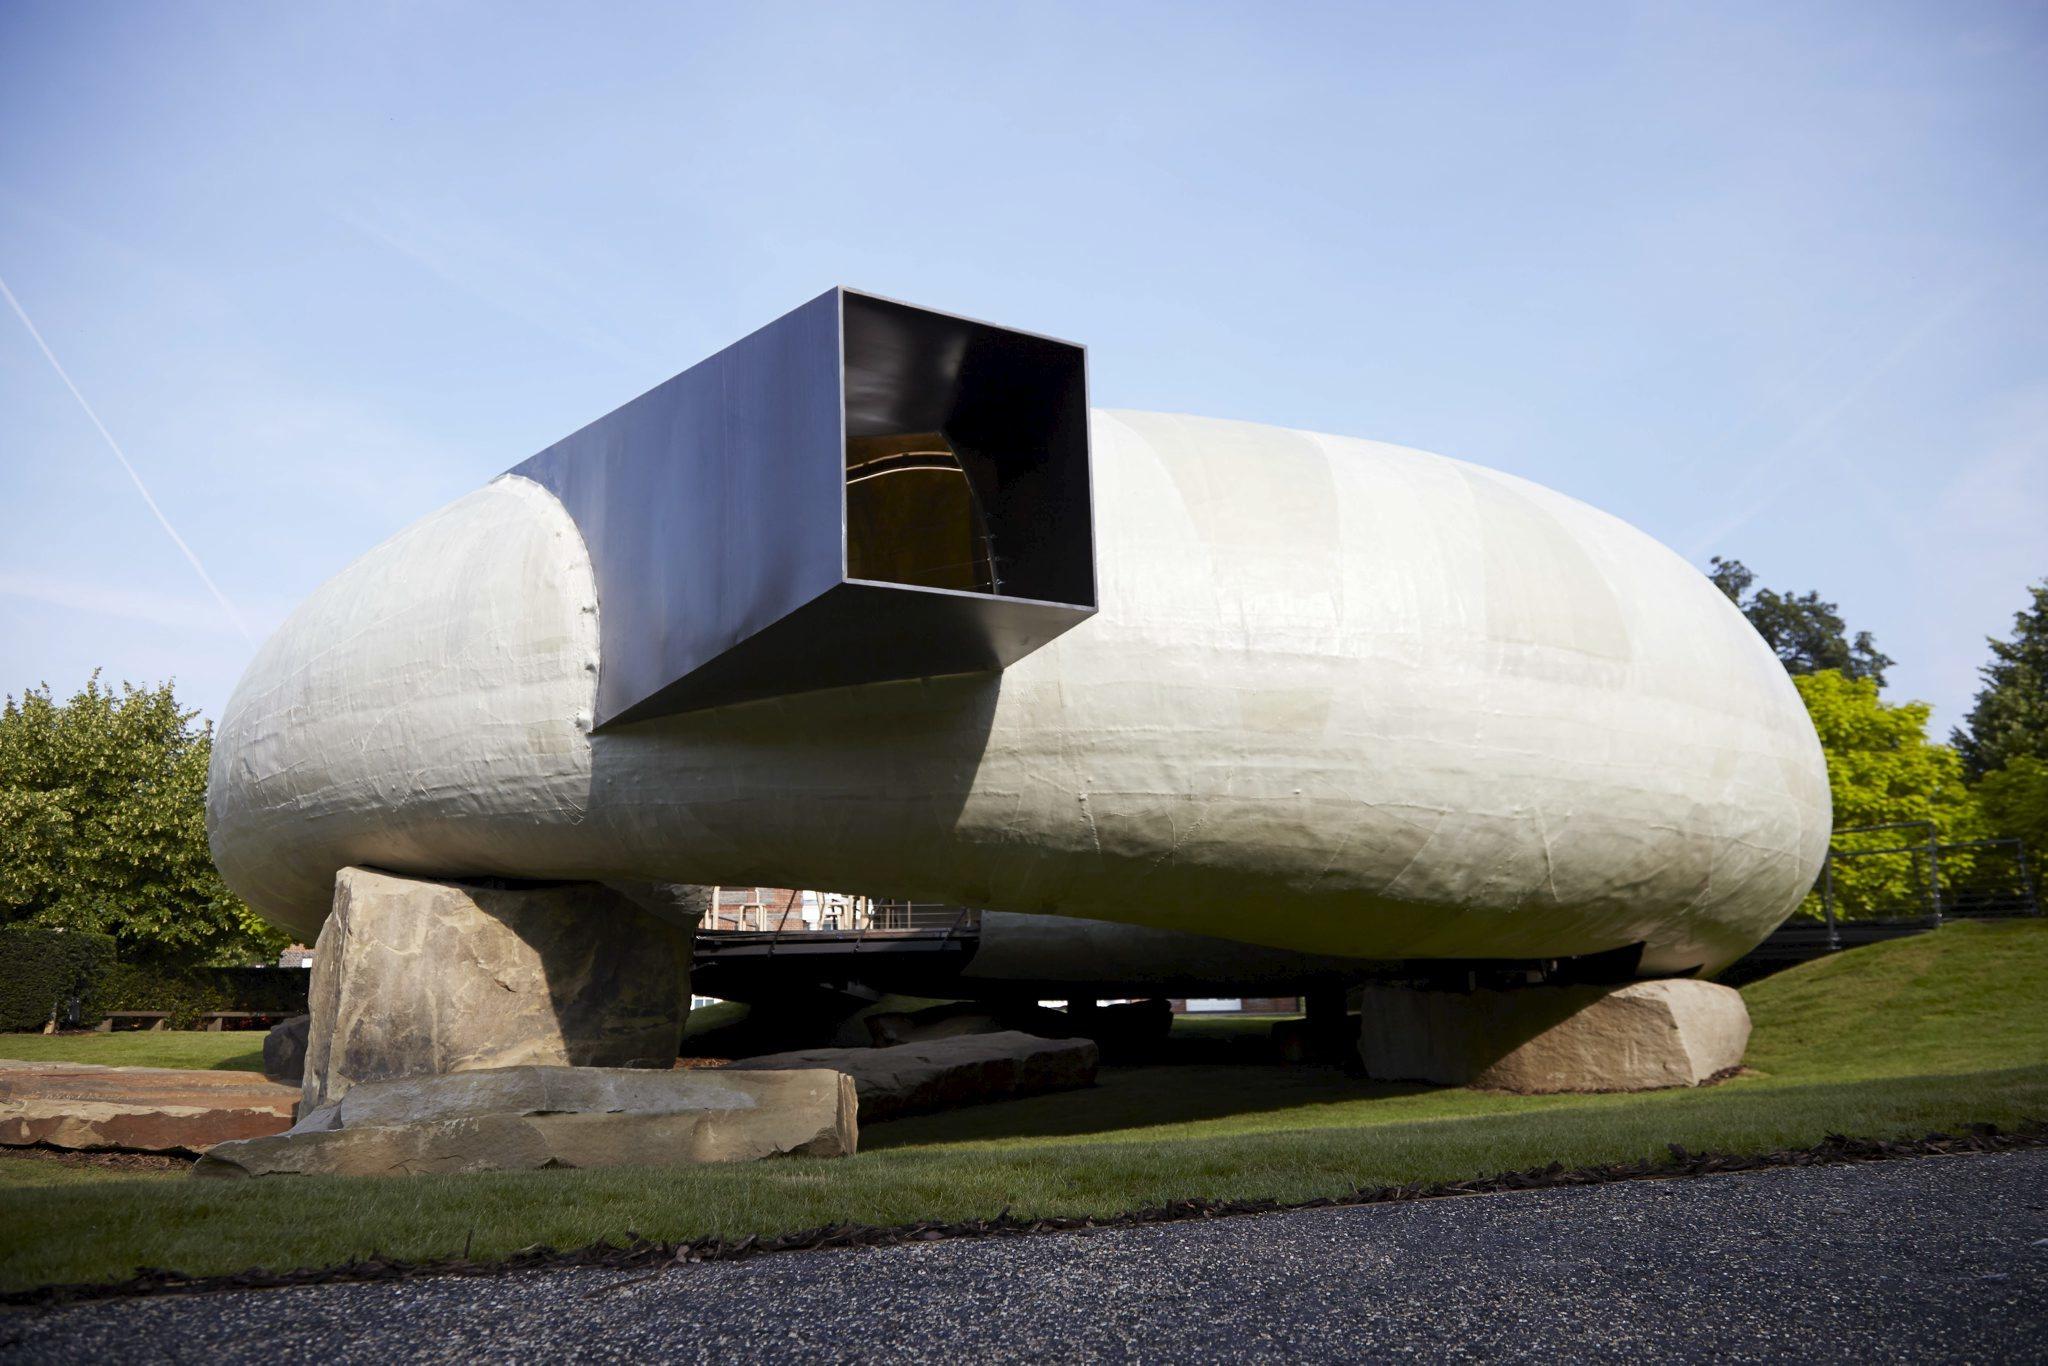 Visit the Serpentine Gallery's summer pavilion